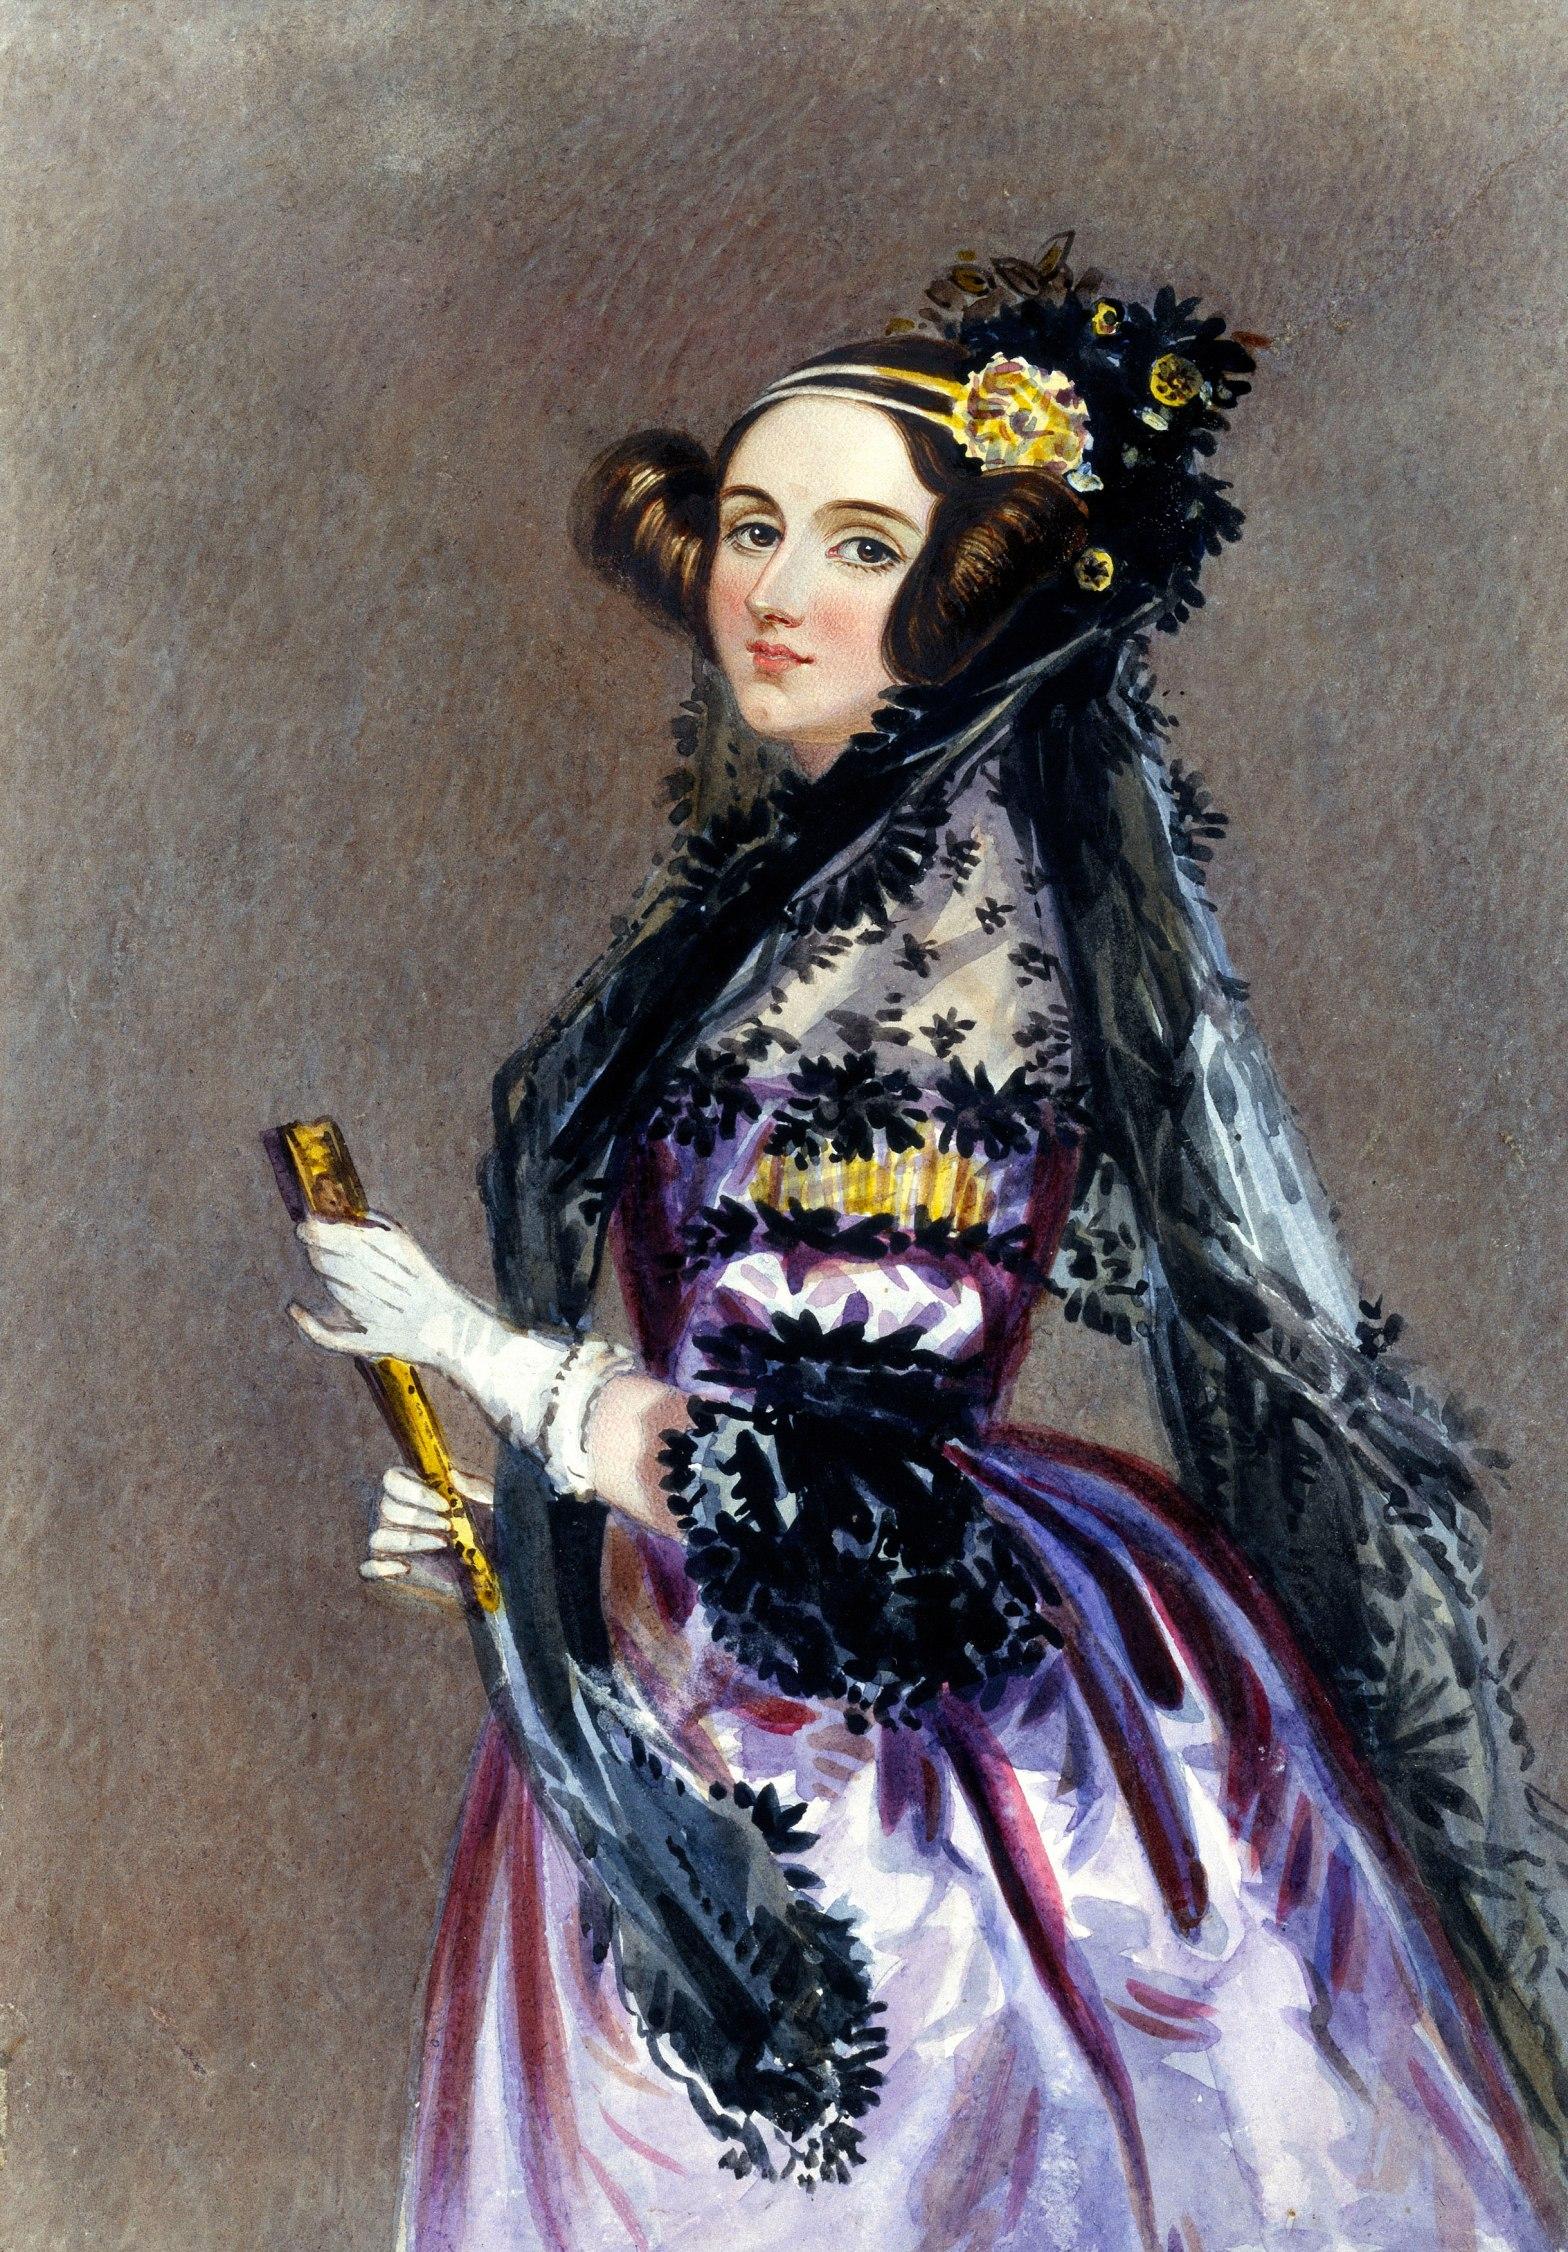 (Wikipedia) Watercolour portait of Ada Lovelace